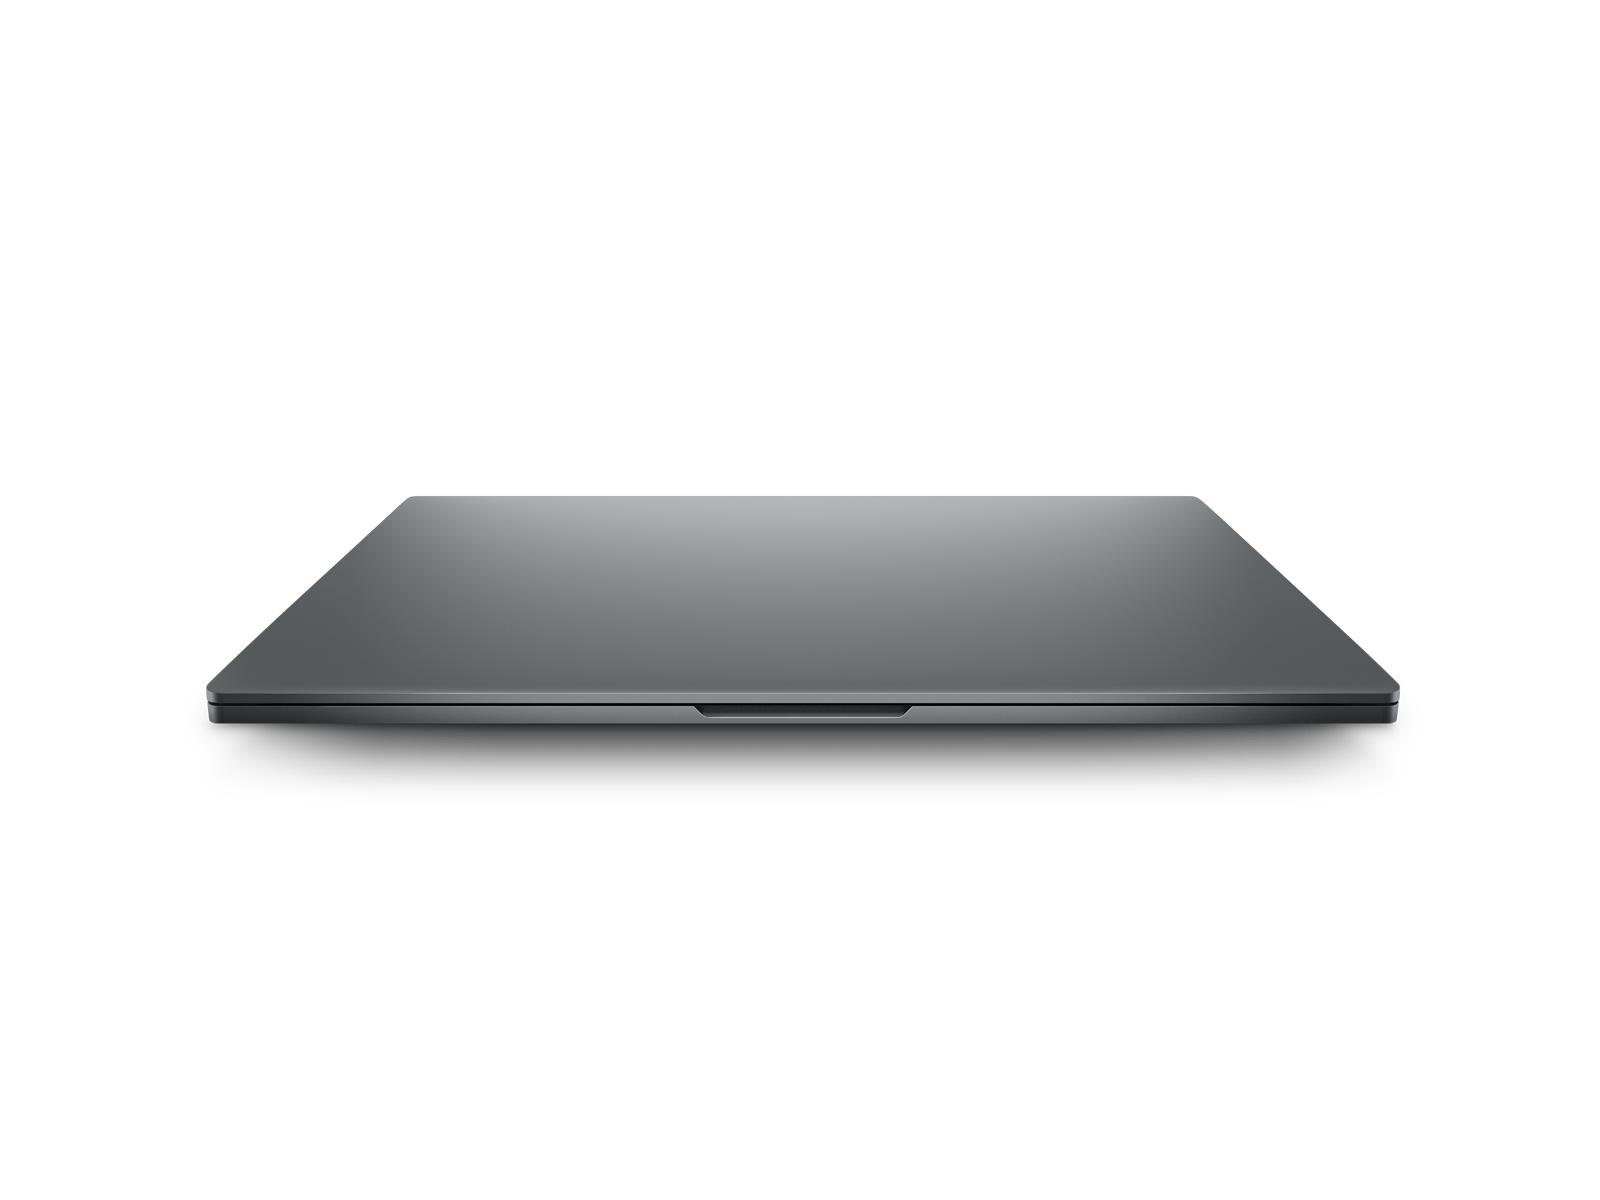 Xiao Mi Notebook Pro